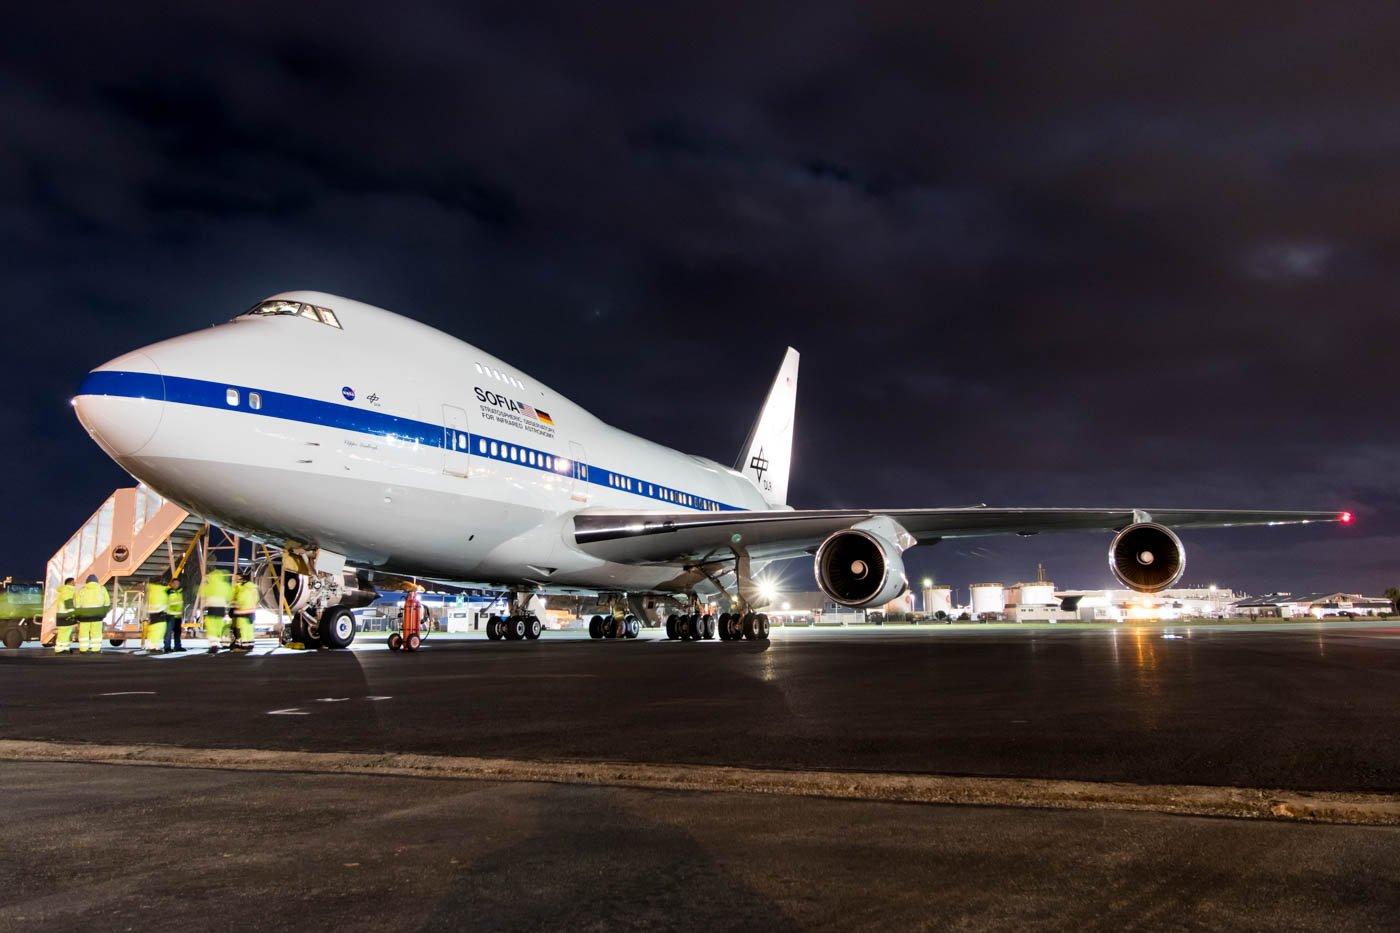 NASA Boeing 747SP SOFIA N747NA at Christchurch Airport